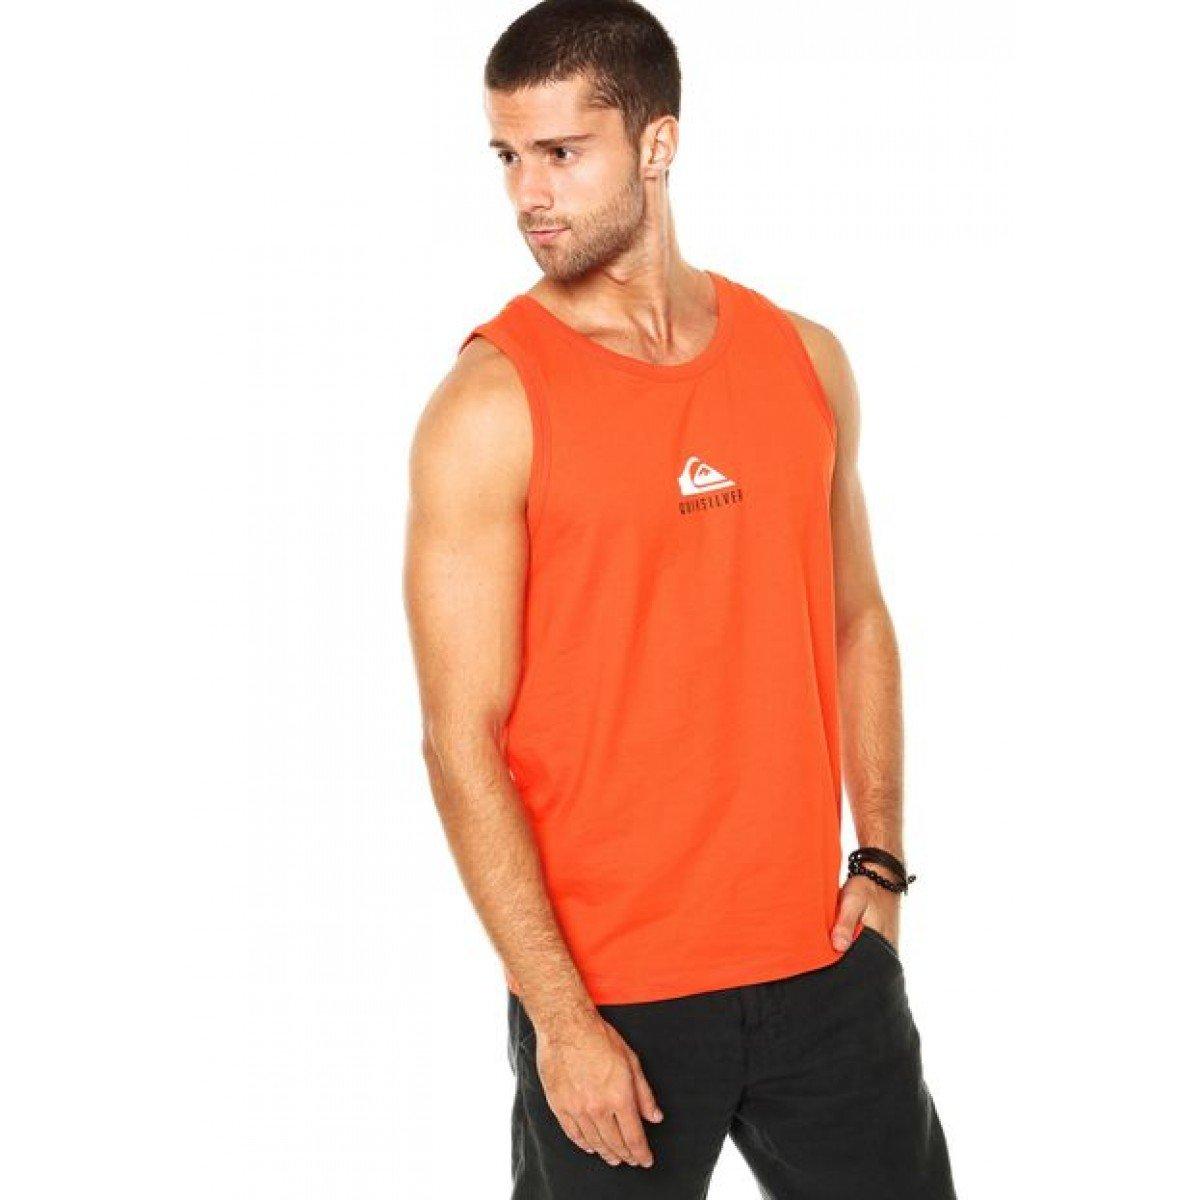 Camiseta Quiksilver Crafty Popsicle Masculina - Laranja